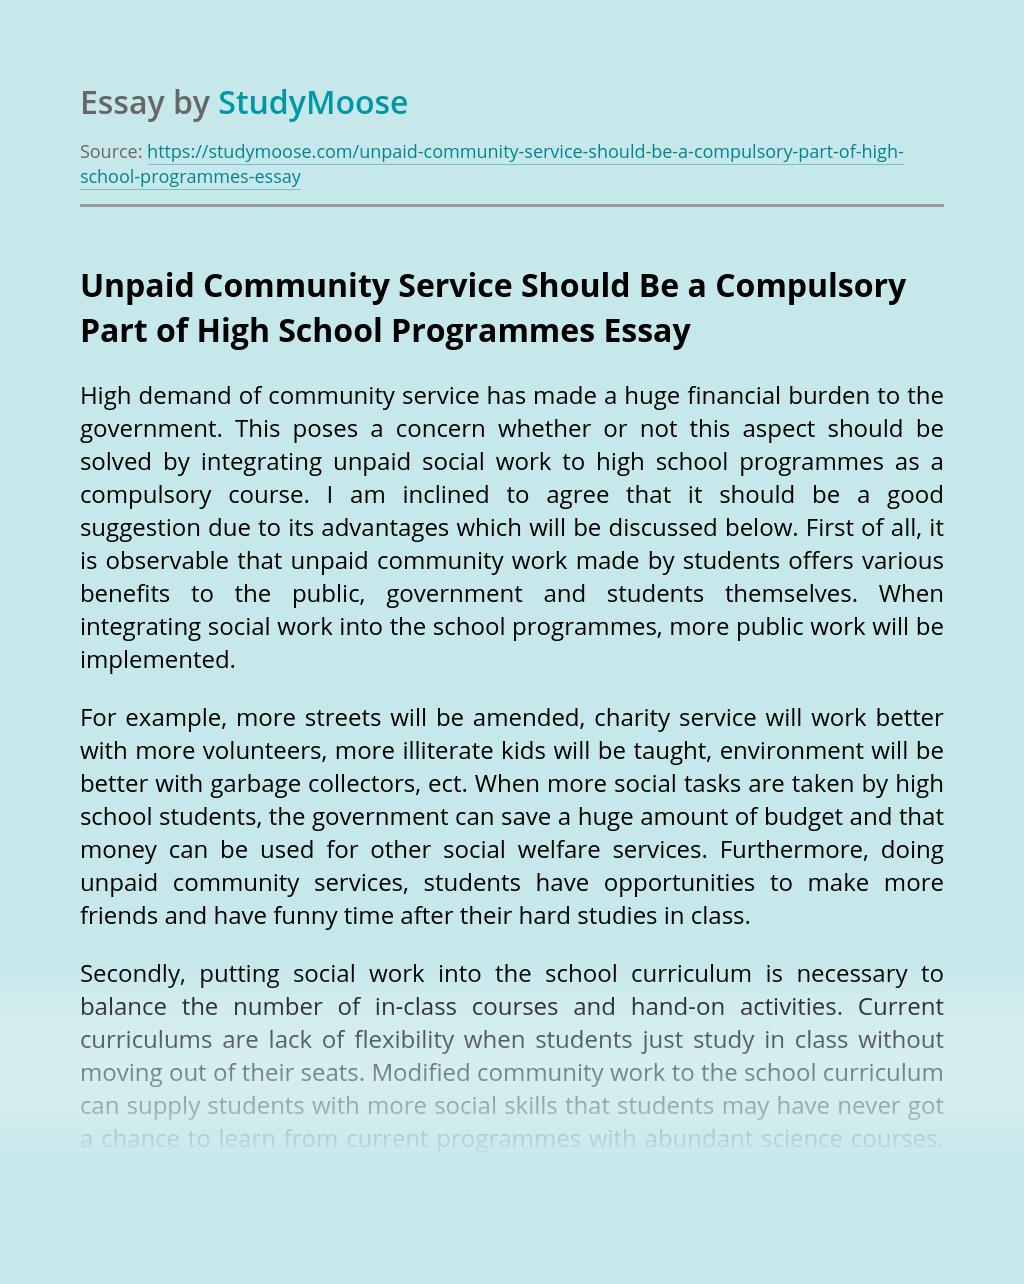 Unpaid Community Service Should Be a Compulsory Part of High School Programmes